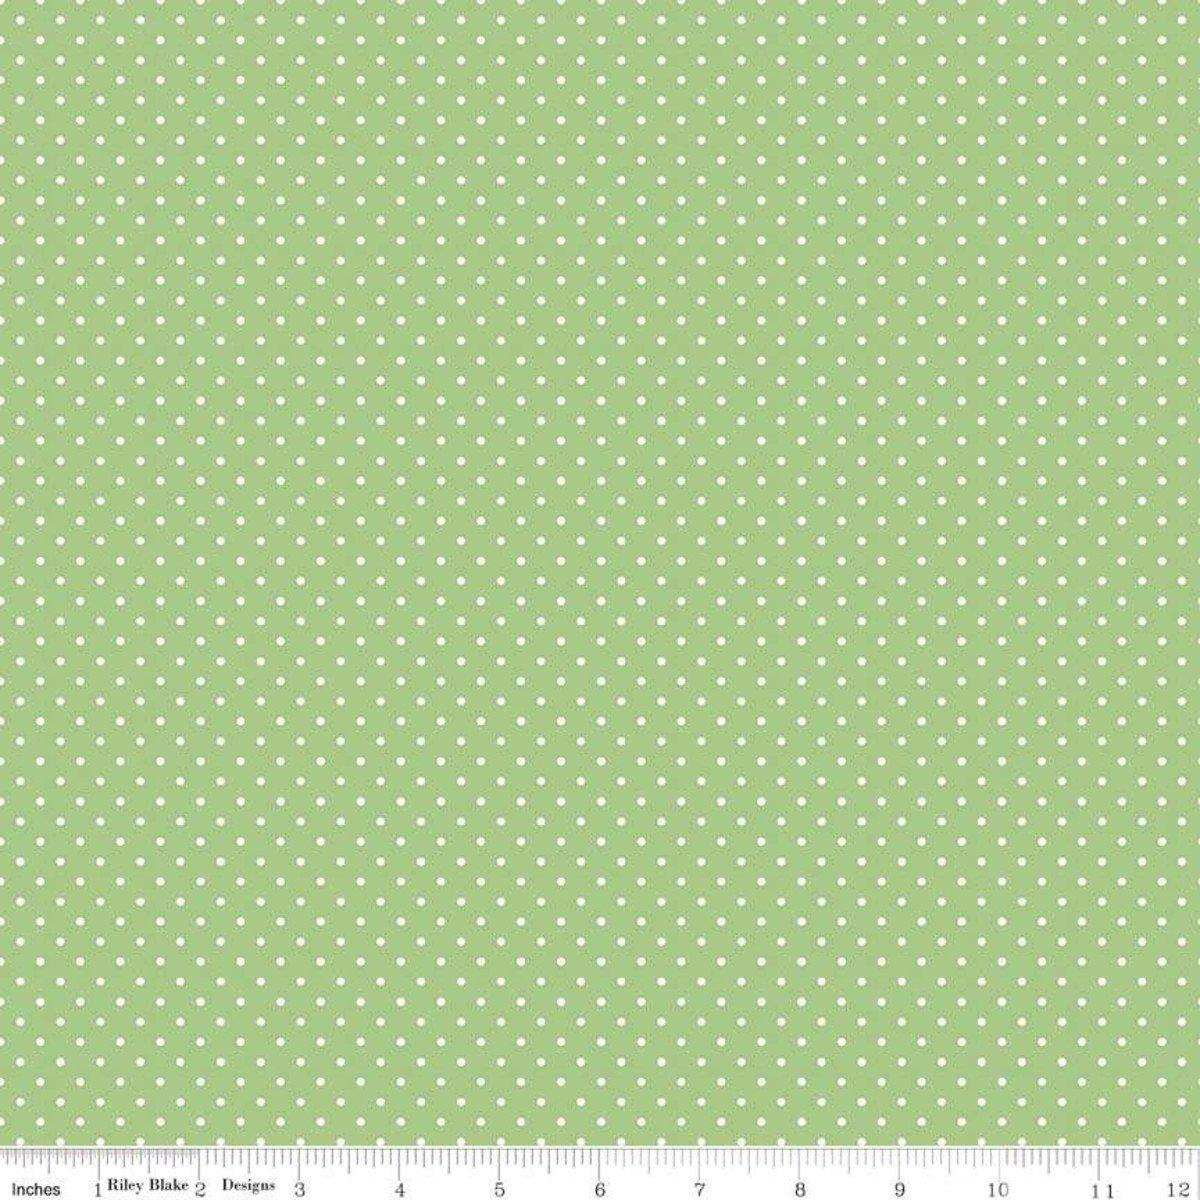 Riley Blake Designs, Swiss Dot - Swiss Dot Green